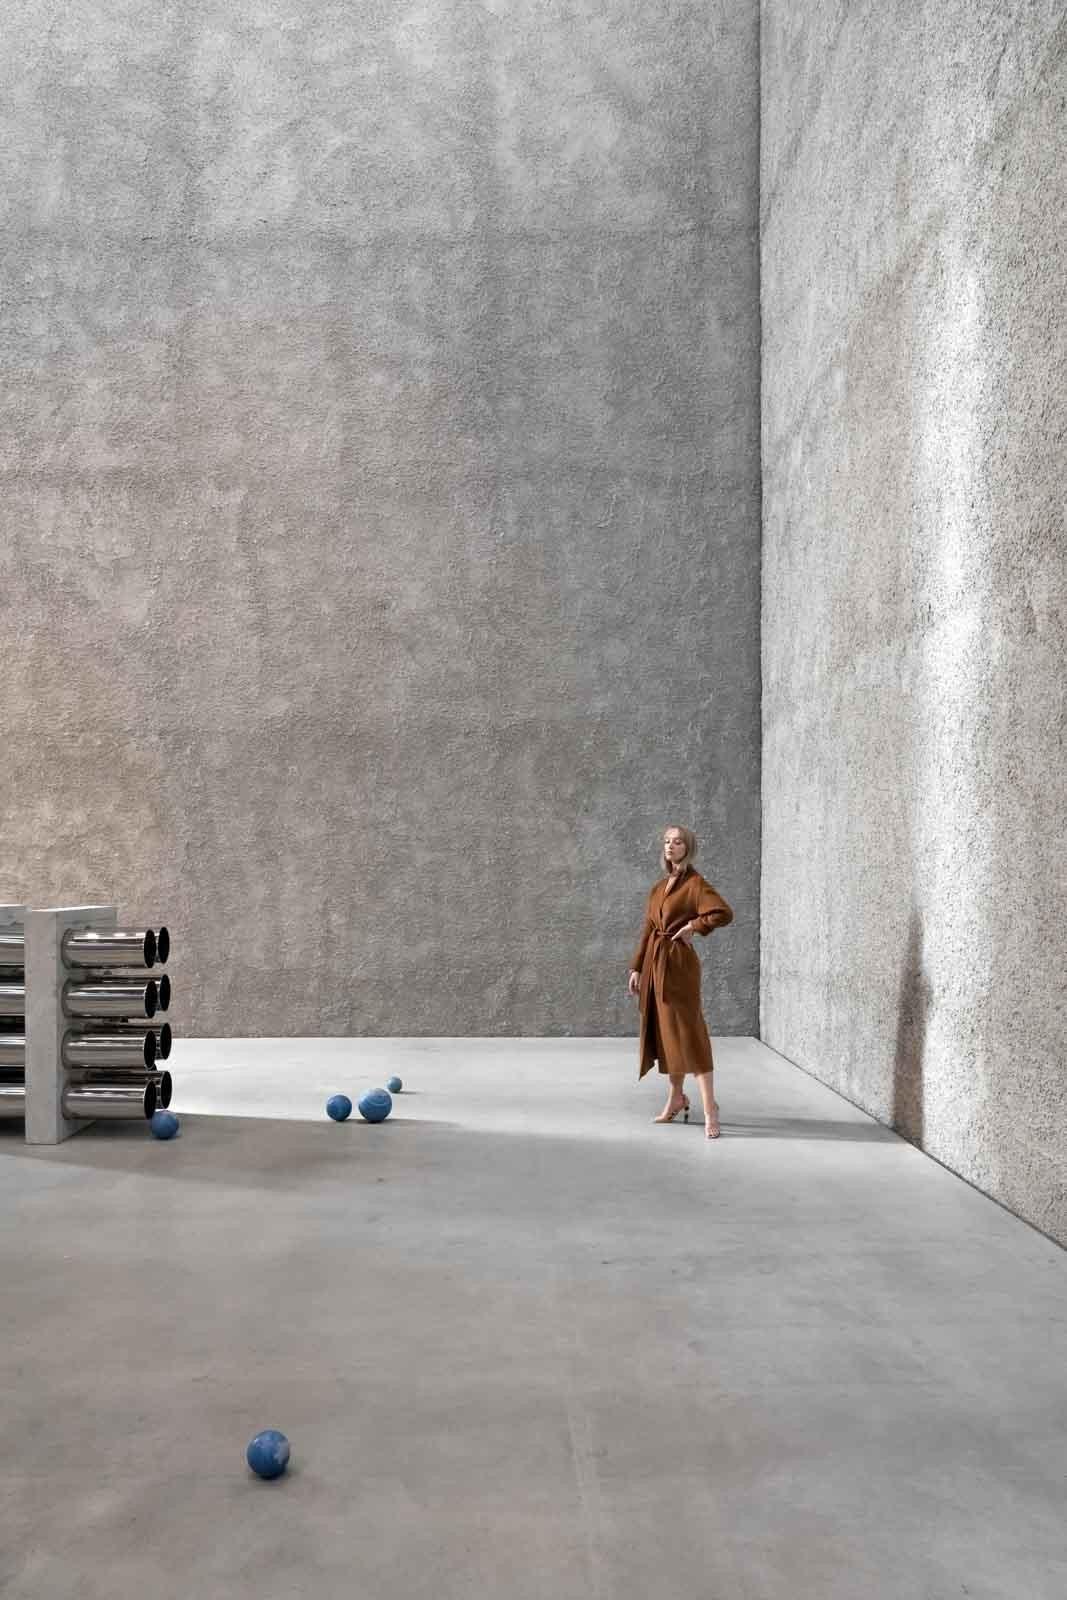 Категория «Приверженец минимализма». Берлин, Германия. Автор Джордж Крусталлис он же Минорстеп